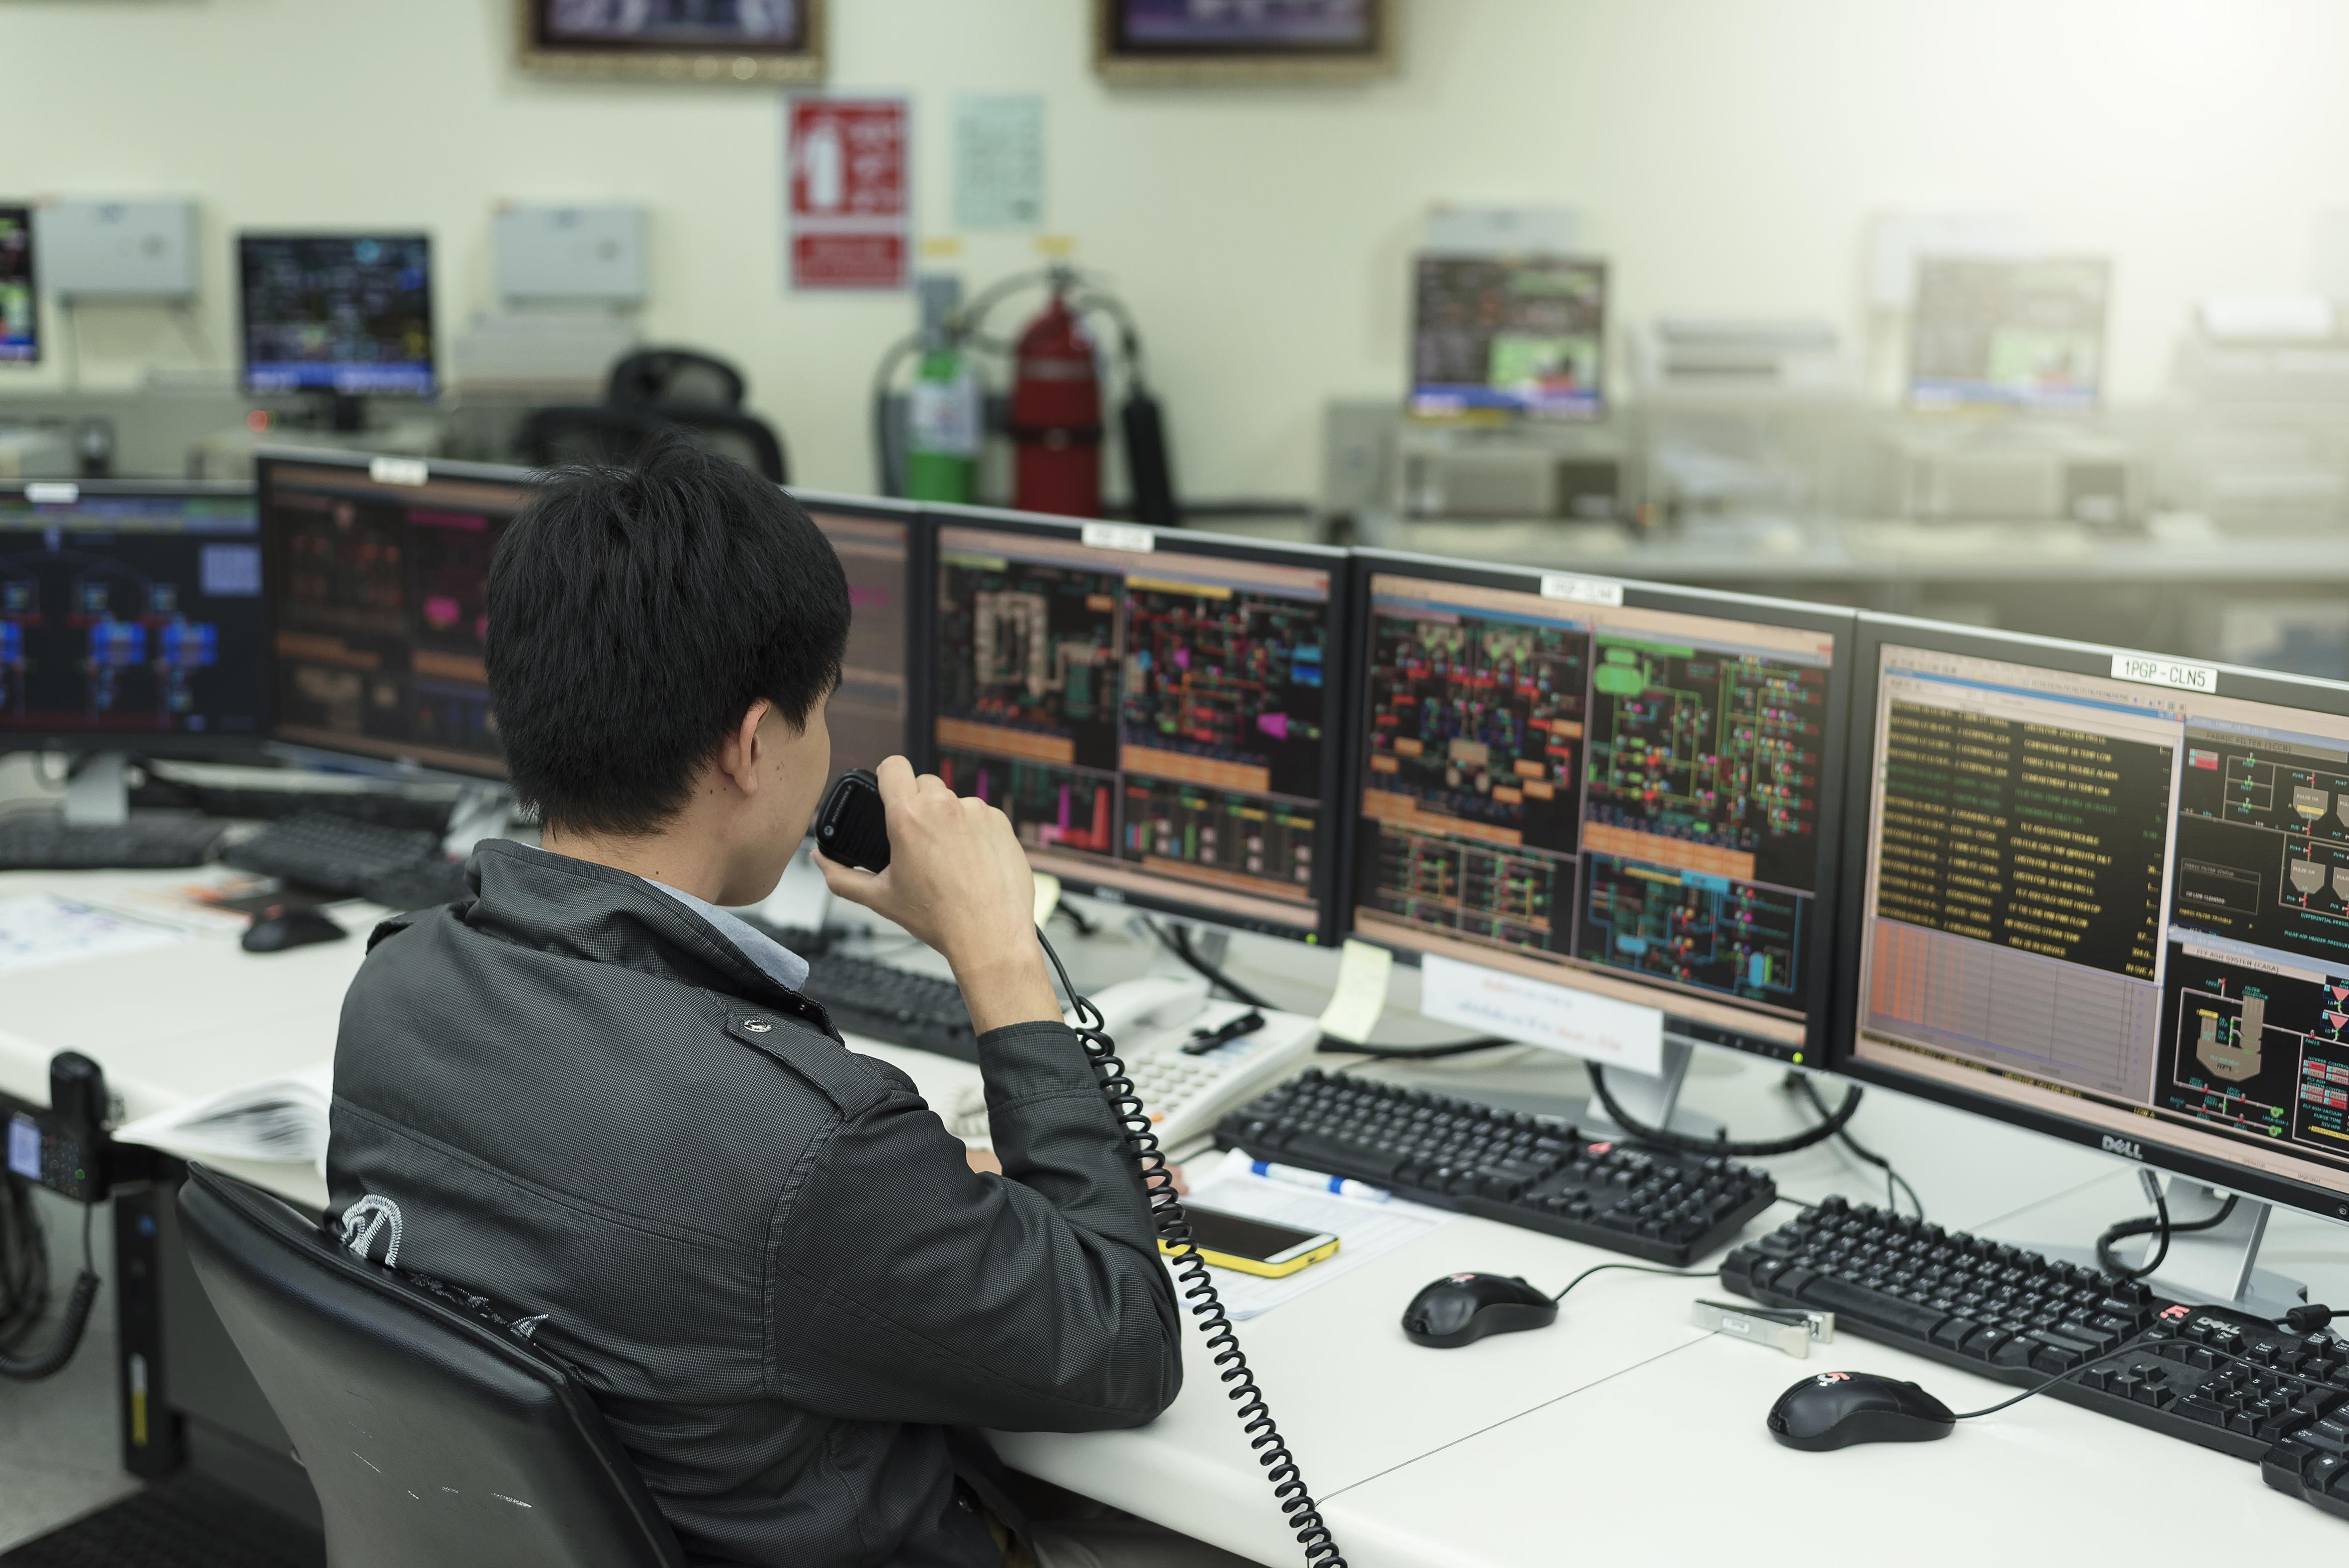 OPITO Control Room Operator